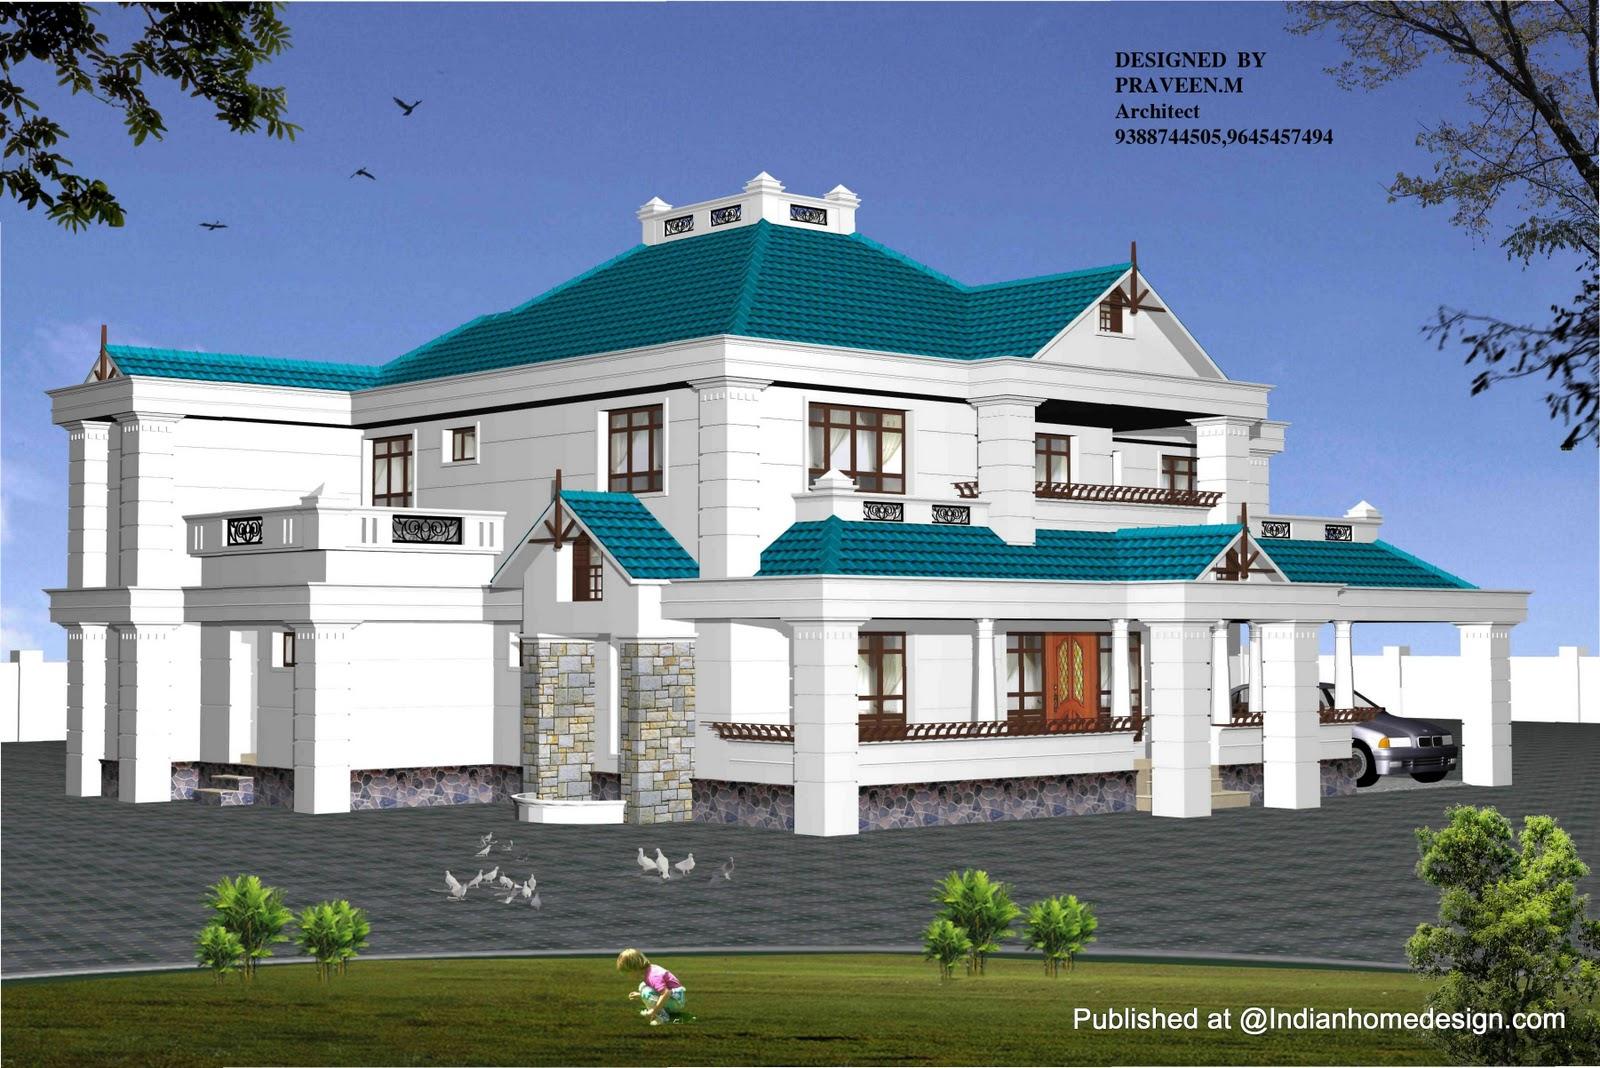 complete house plans nabelea com marvelous complete house plans 2 latest trend kerala home plan